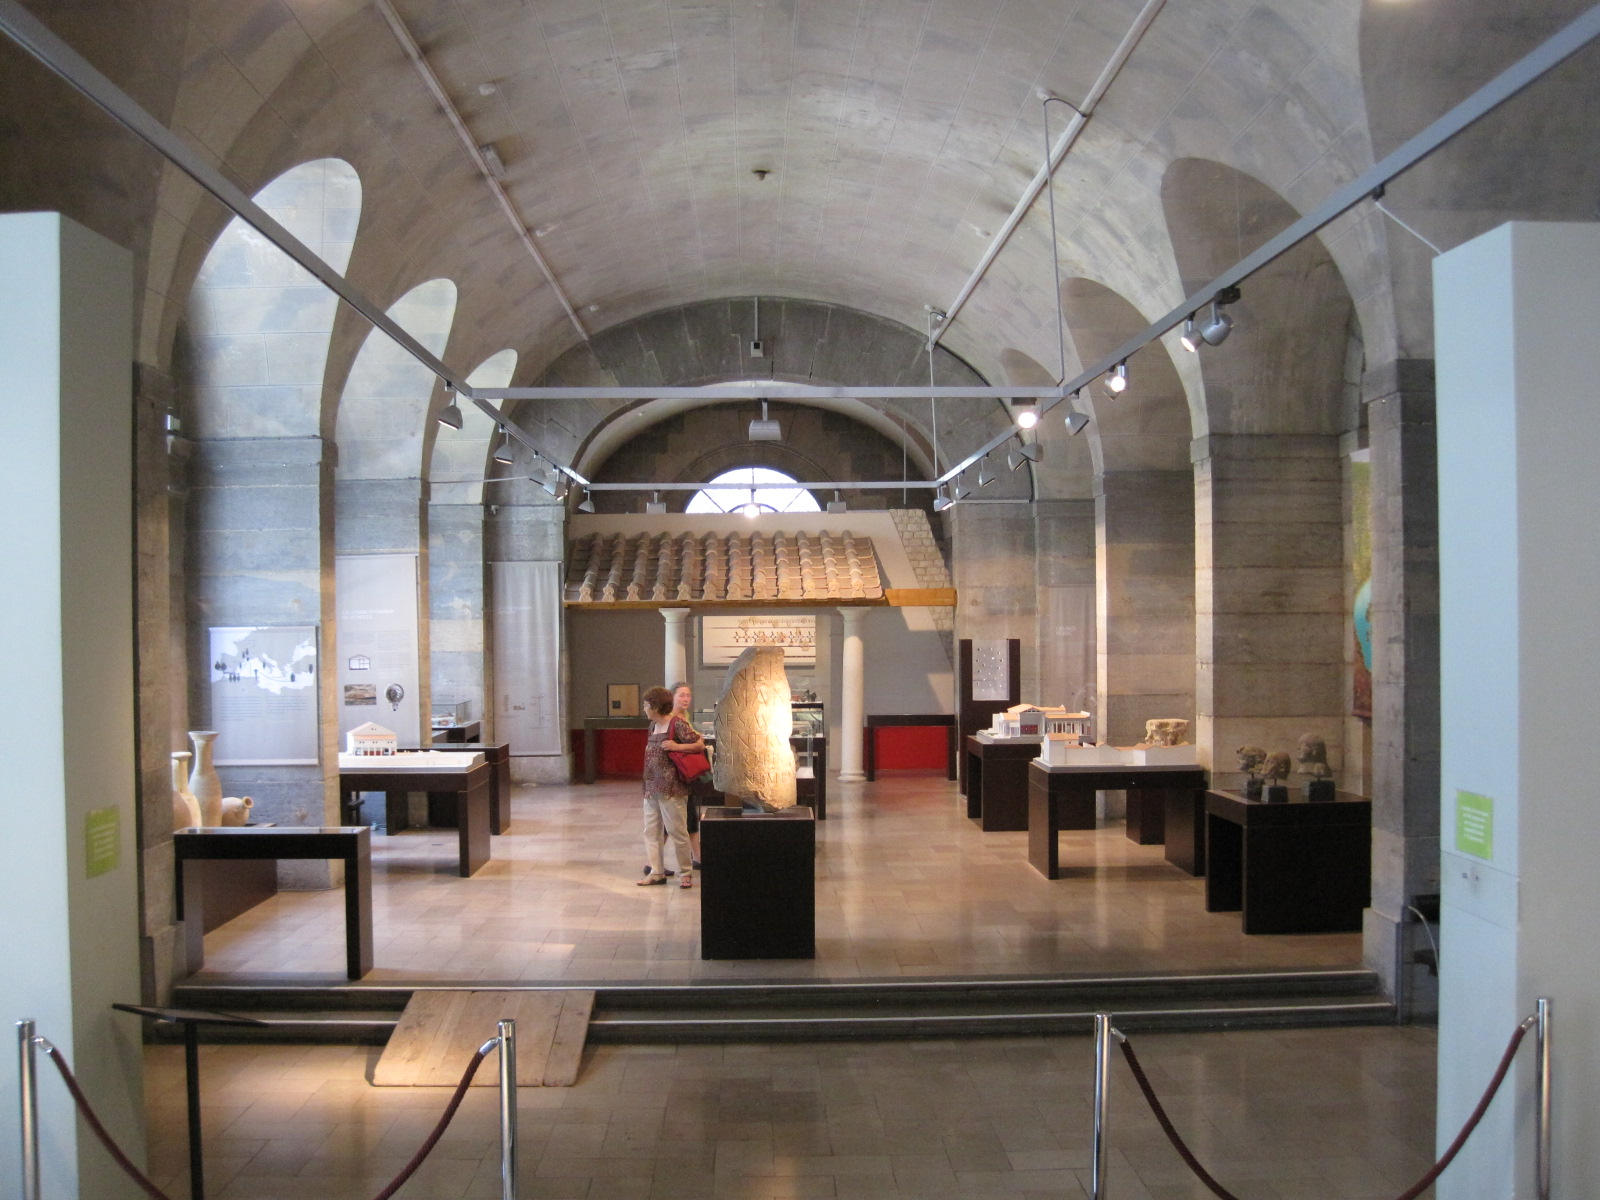 Musée_BeauxArts_Besançon_062.jpg